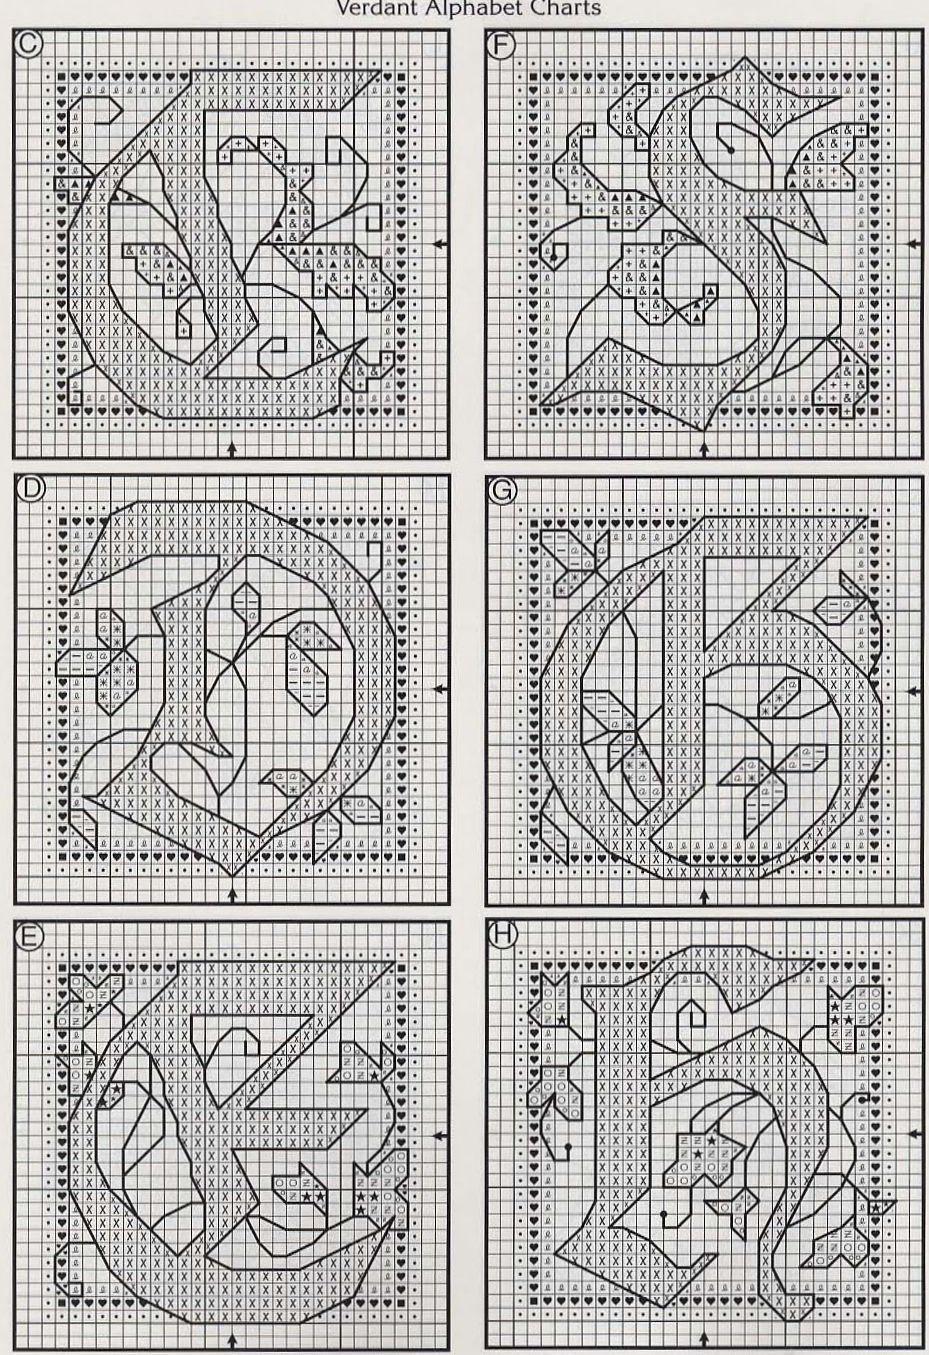 celtic Verdant alphabet 2 | XS | Pinterest | Abecedario punto de ...